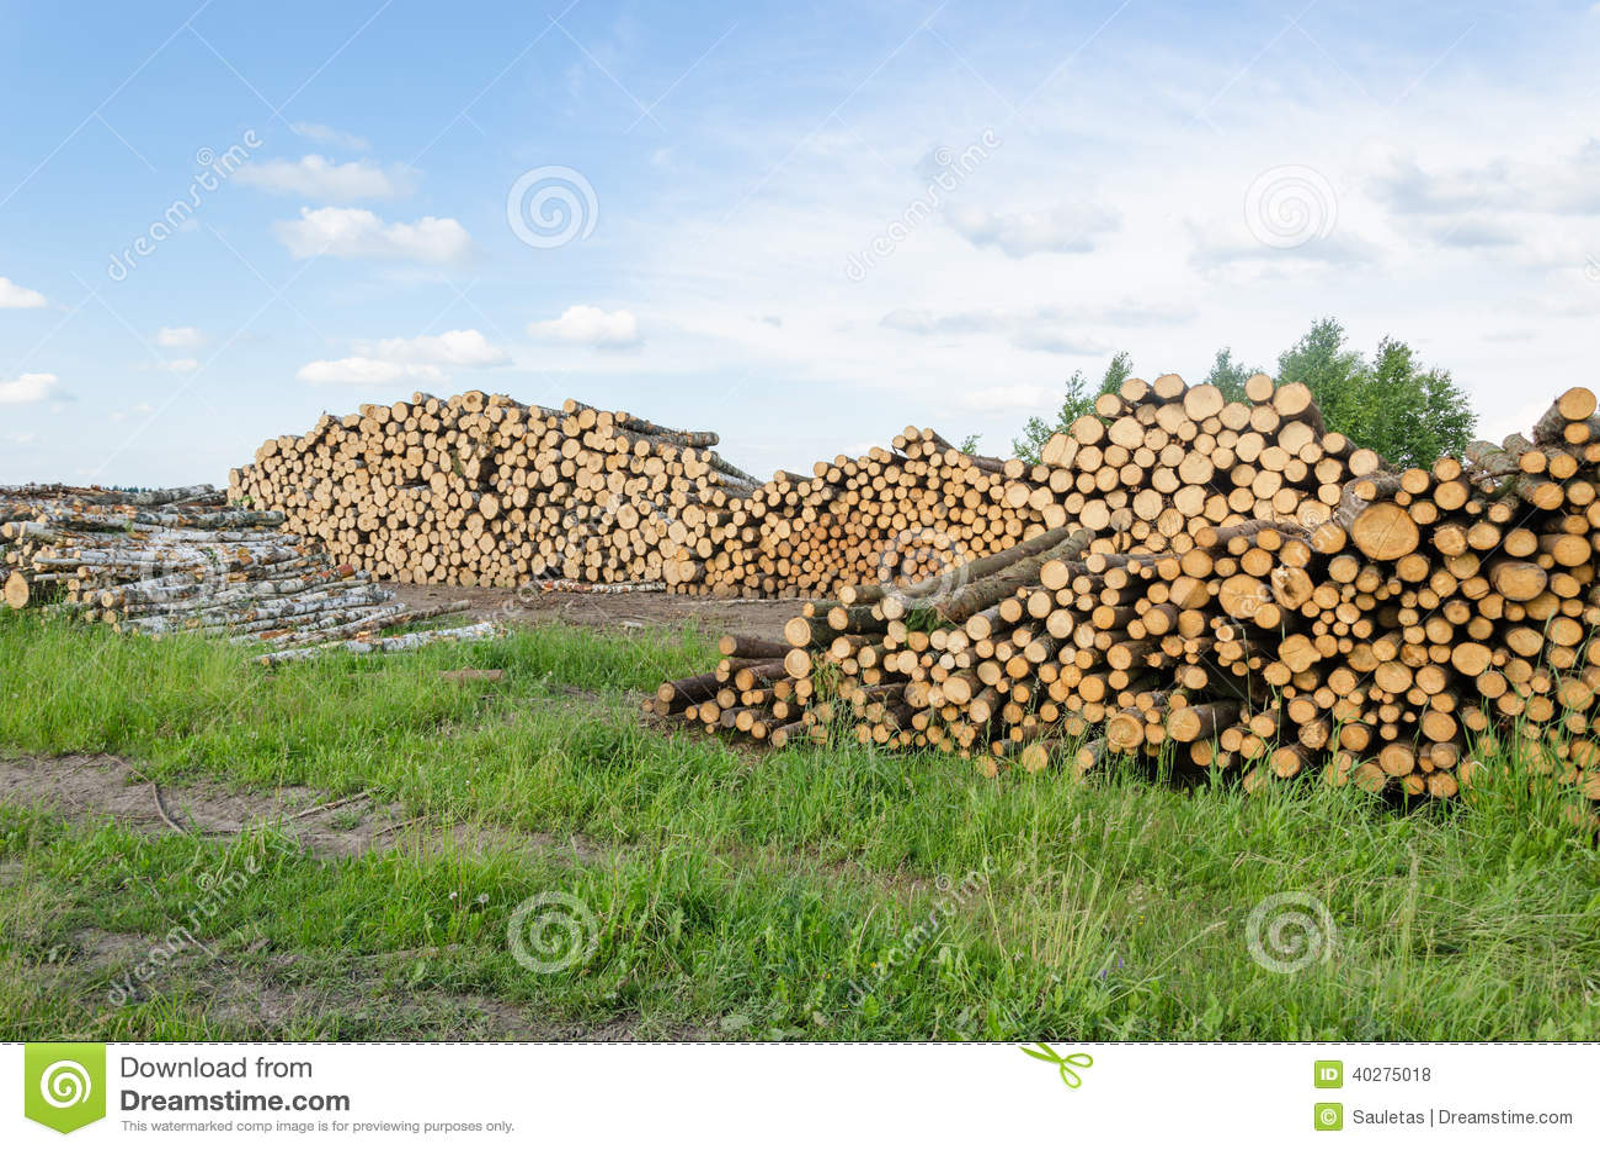 Журналы березы и сосны топлива швырка штабелируют лес